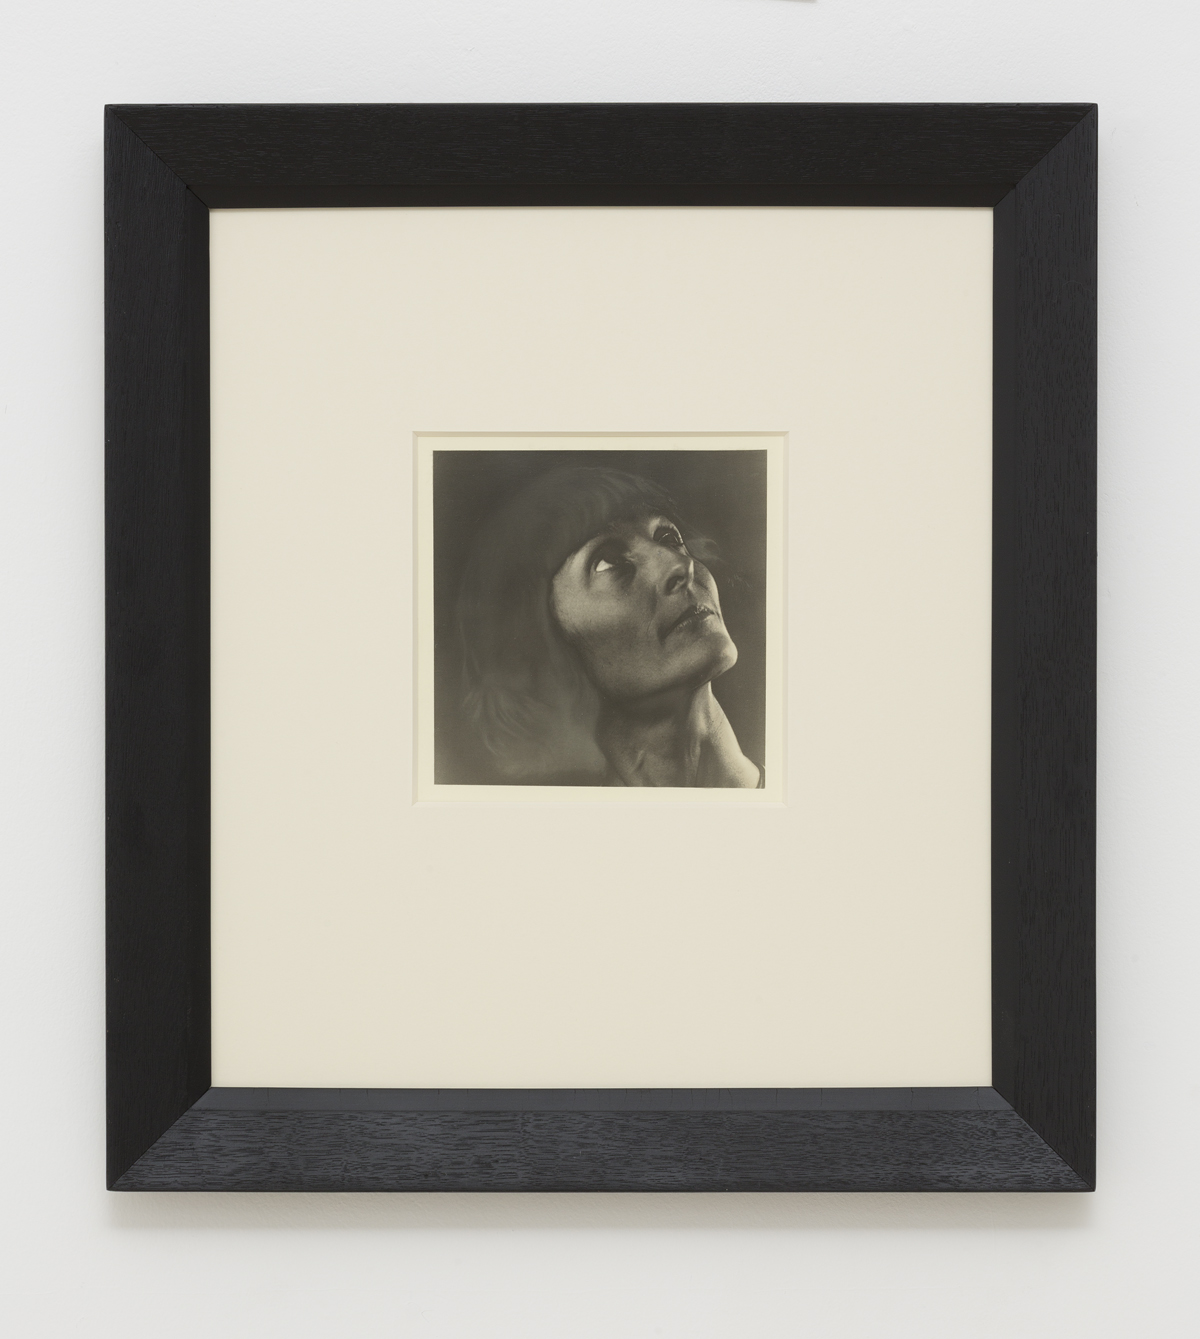 Simon Kennedy, Dr Cornell,Artist, Gallery 9